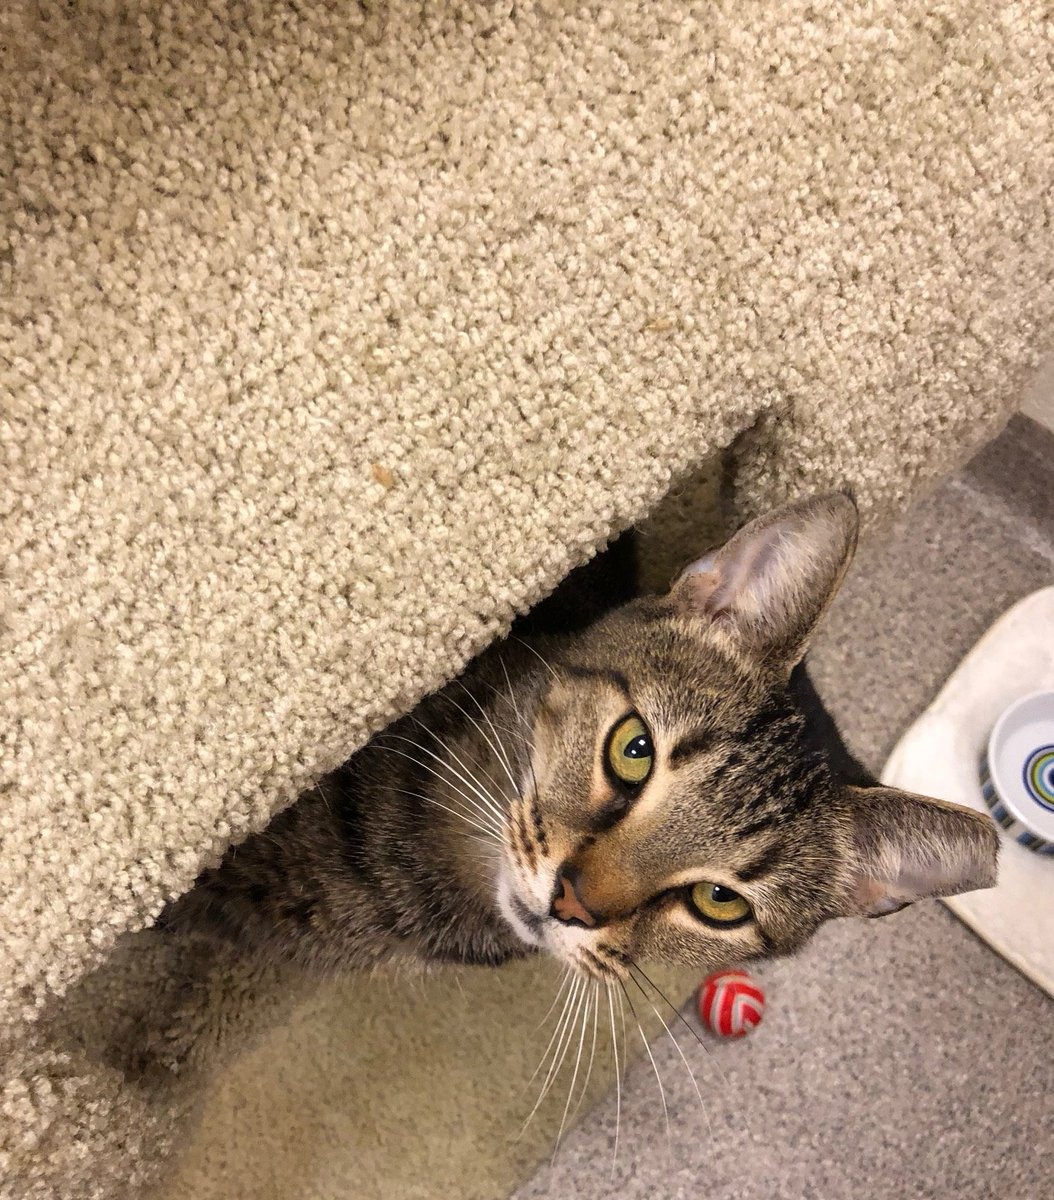 Cat Depot on Twitter: